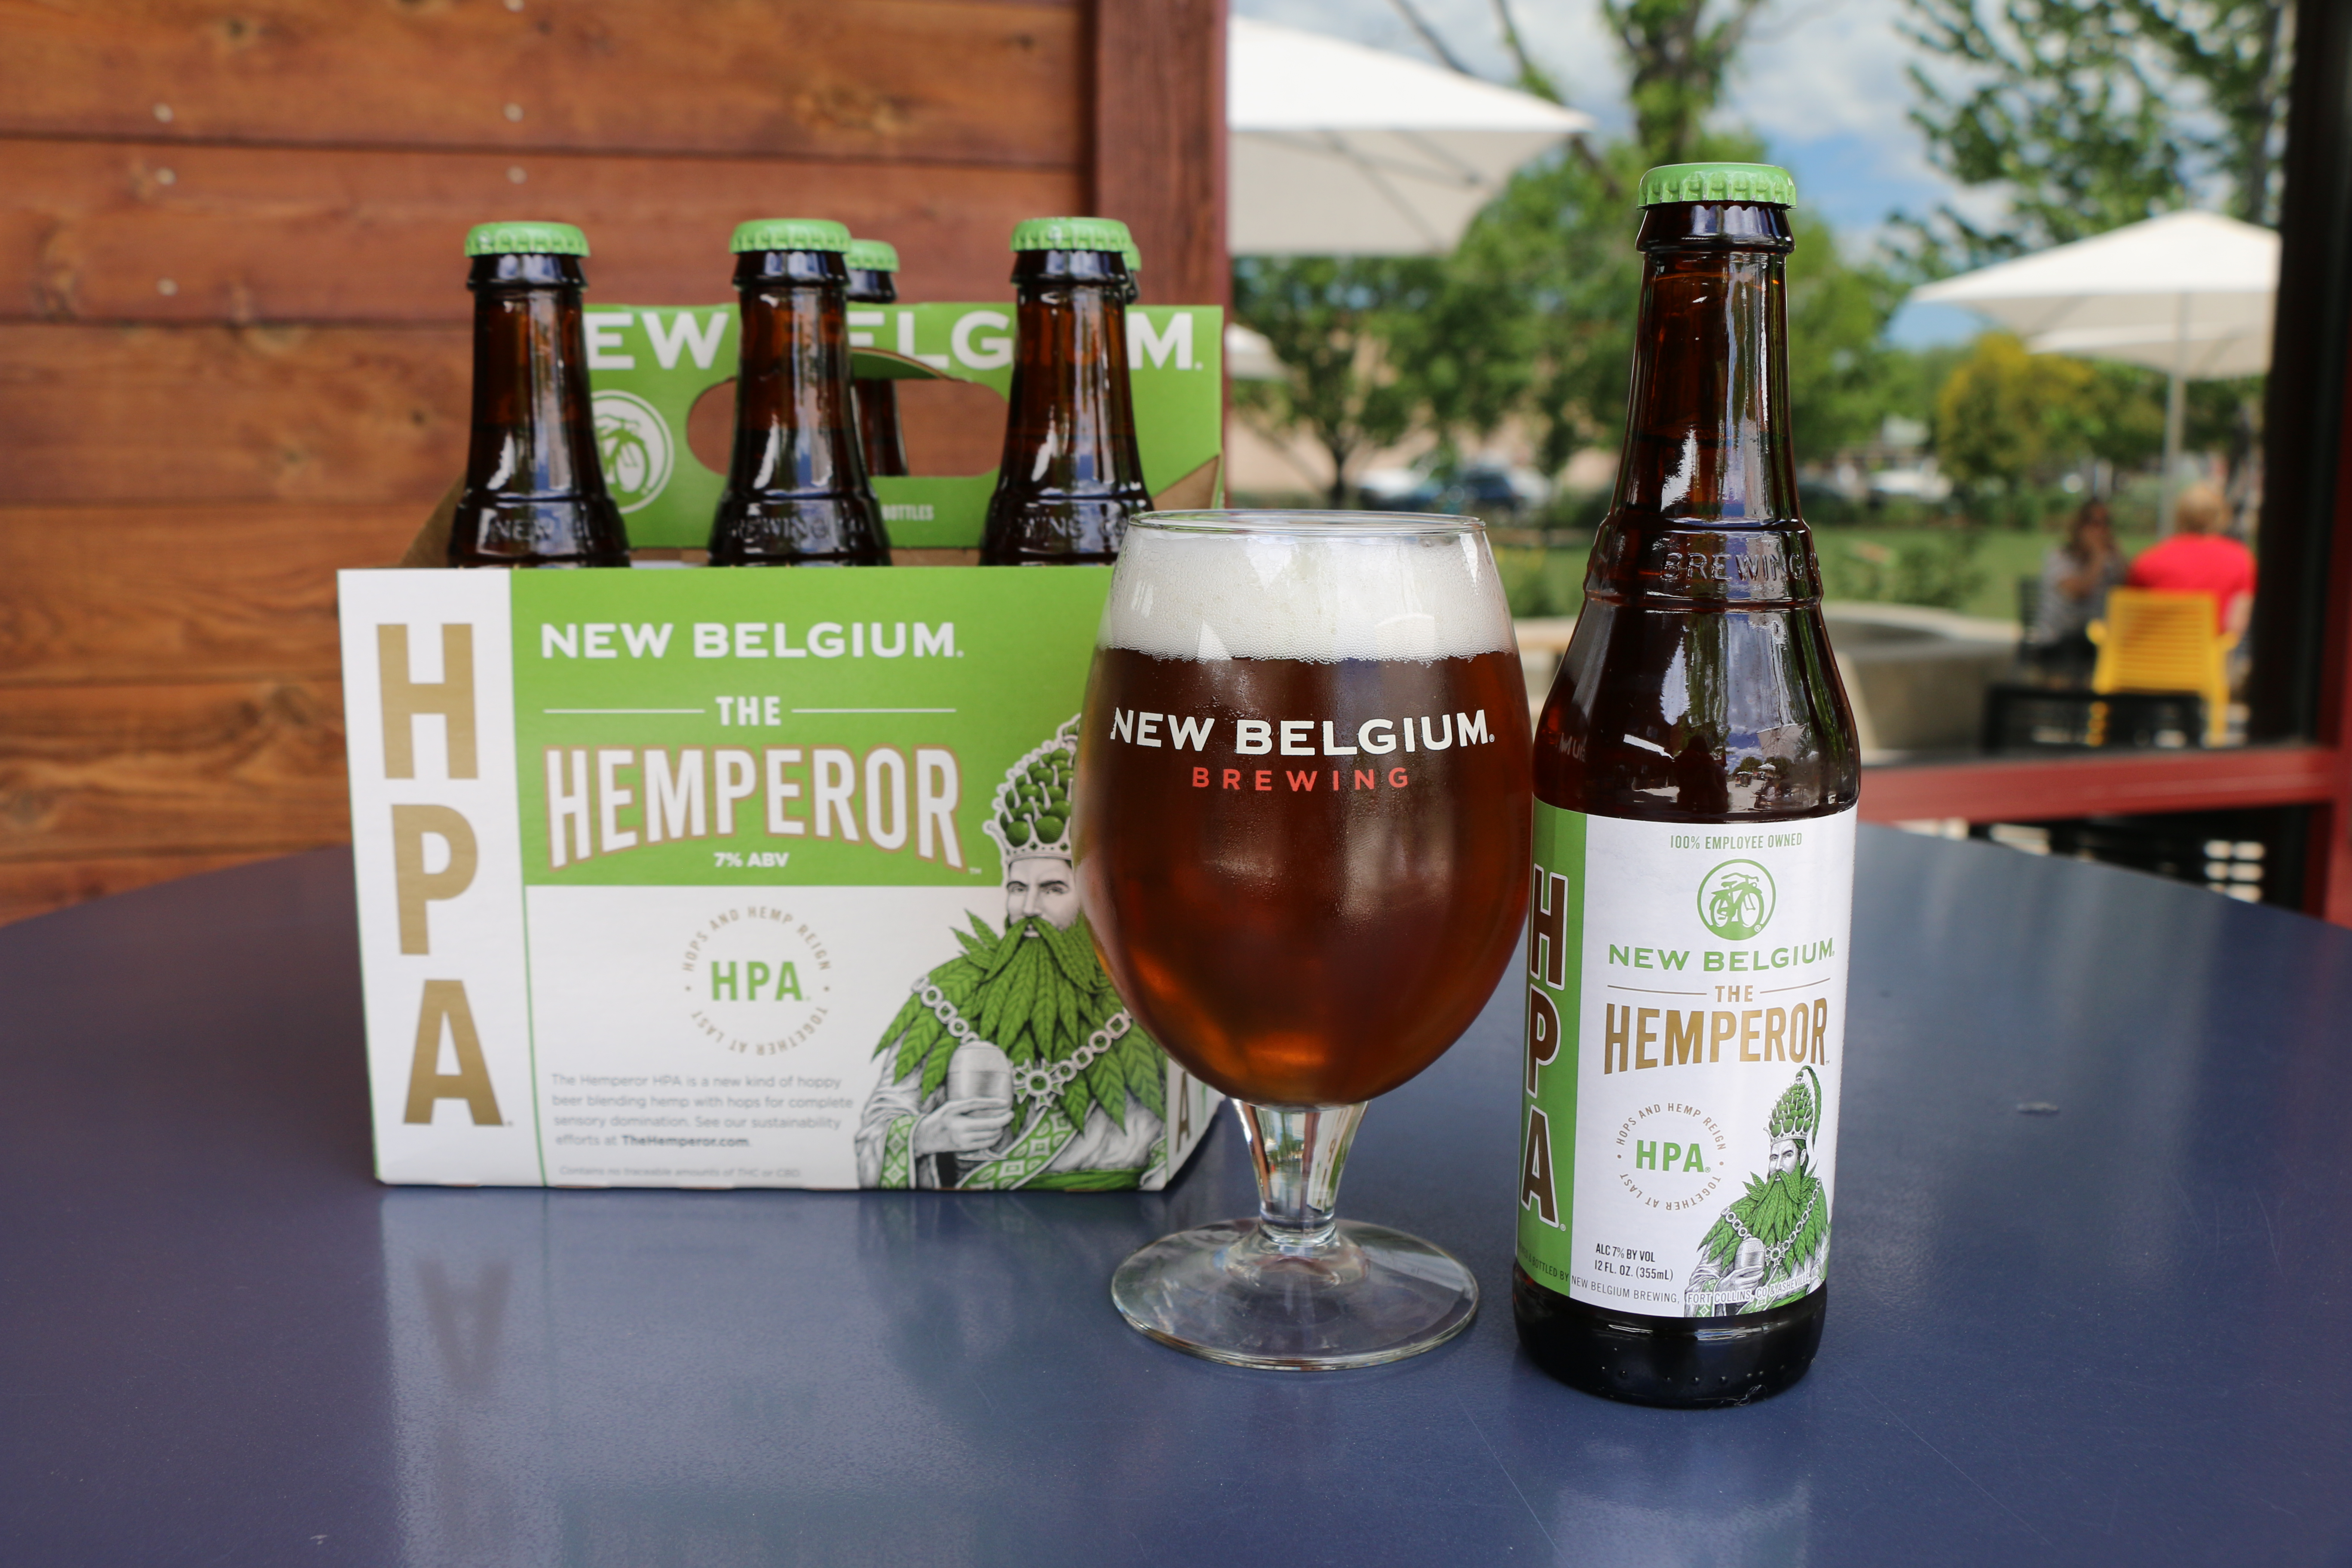 New Belgium Expands Distribution of Hemperor HPA into Kansas